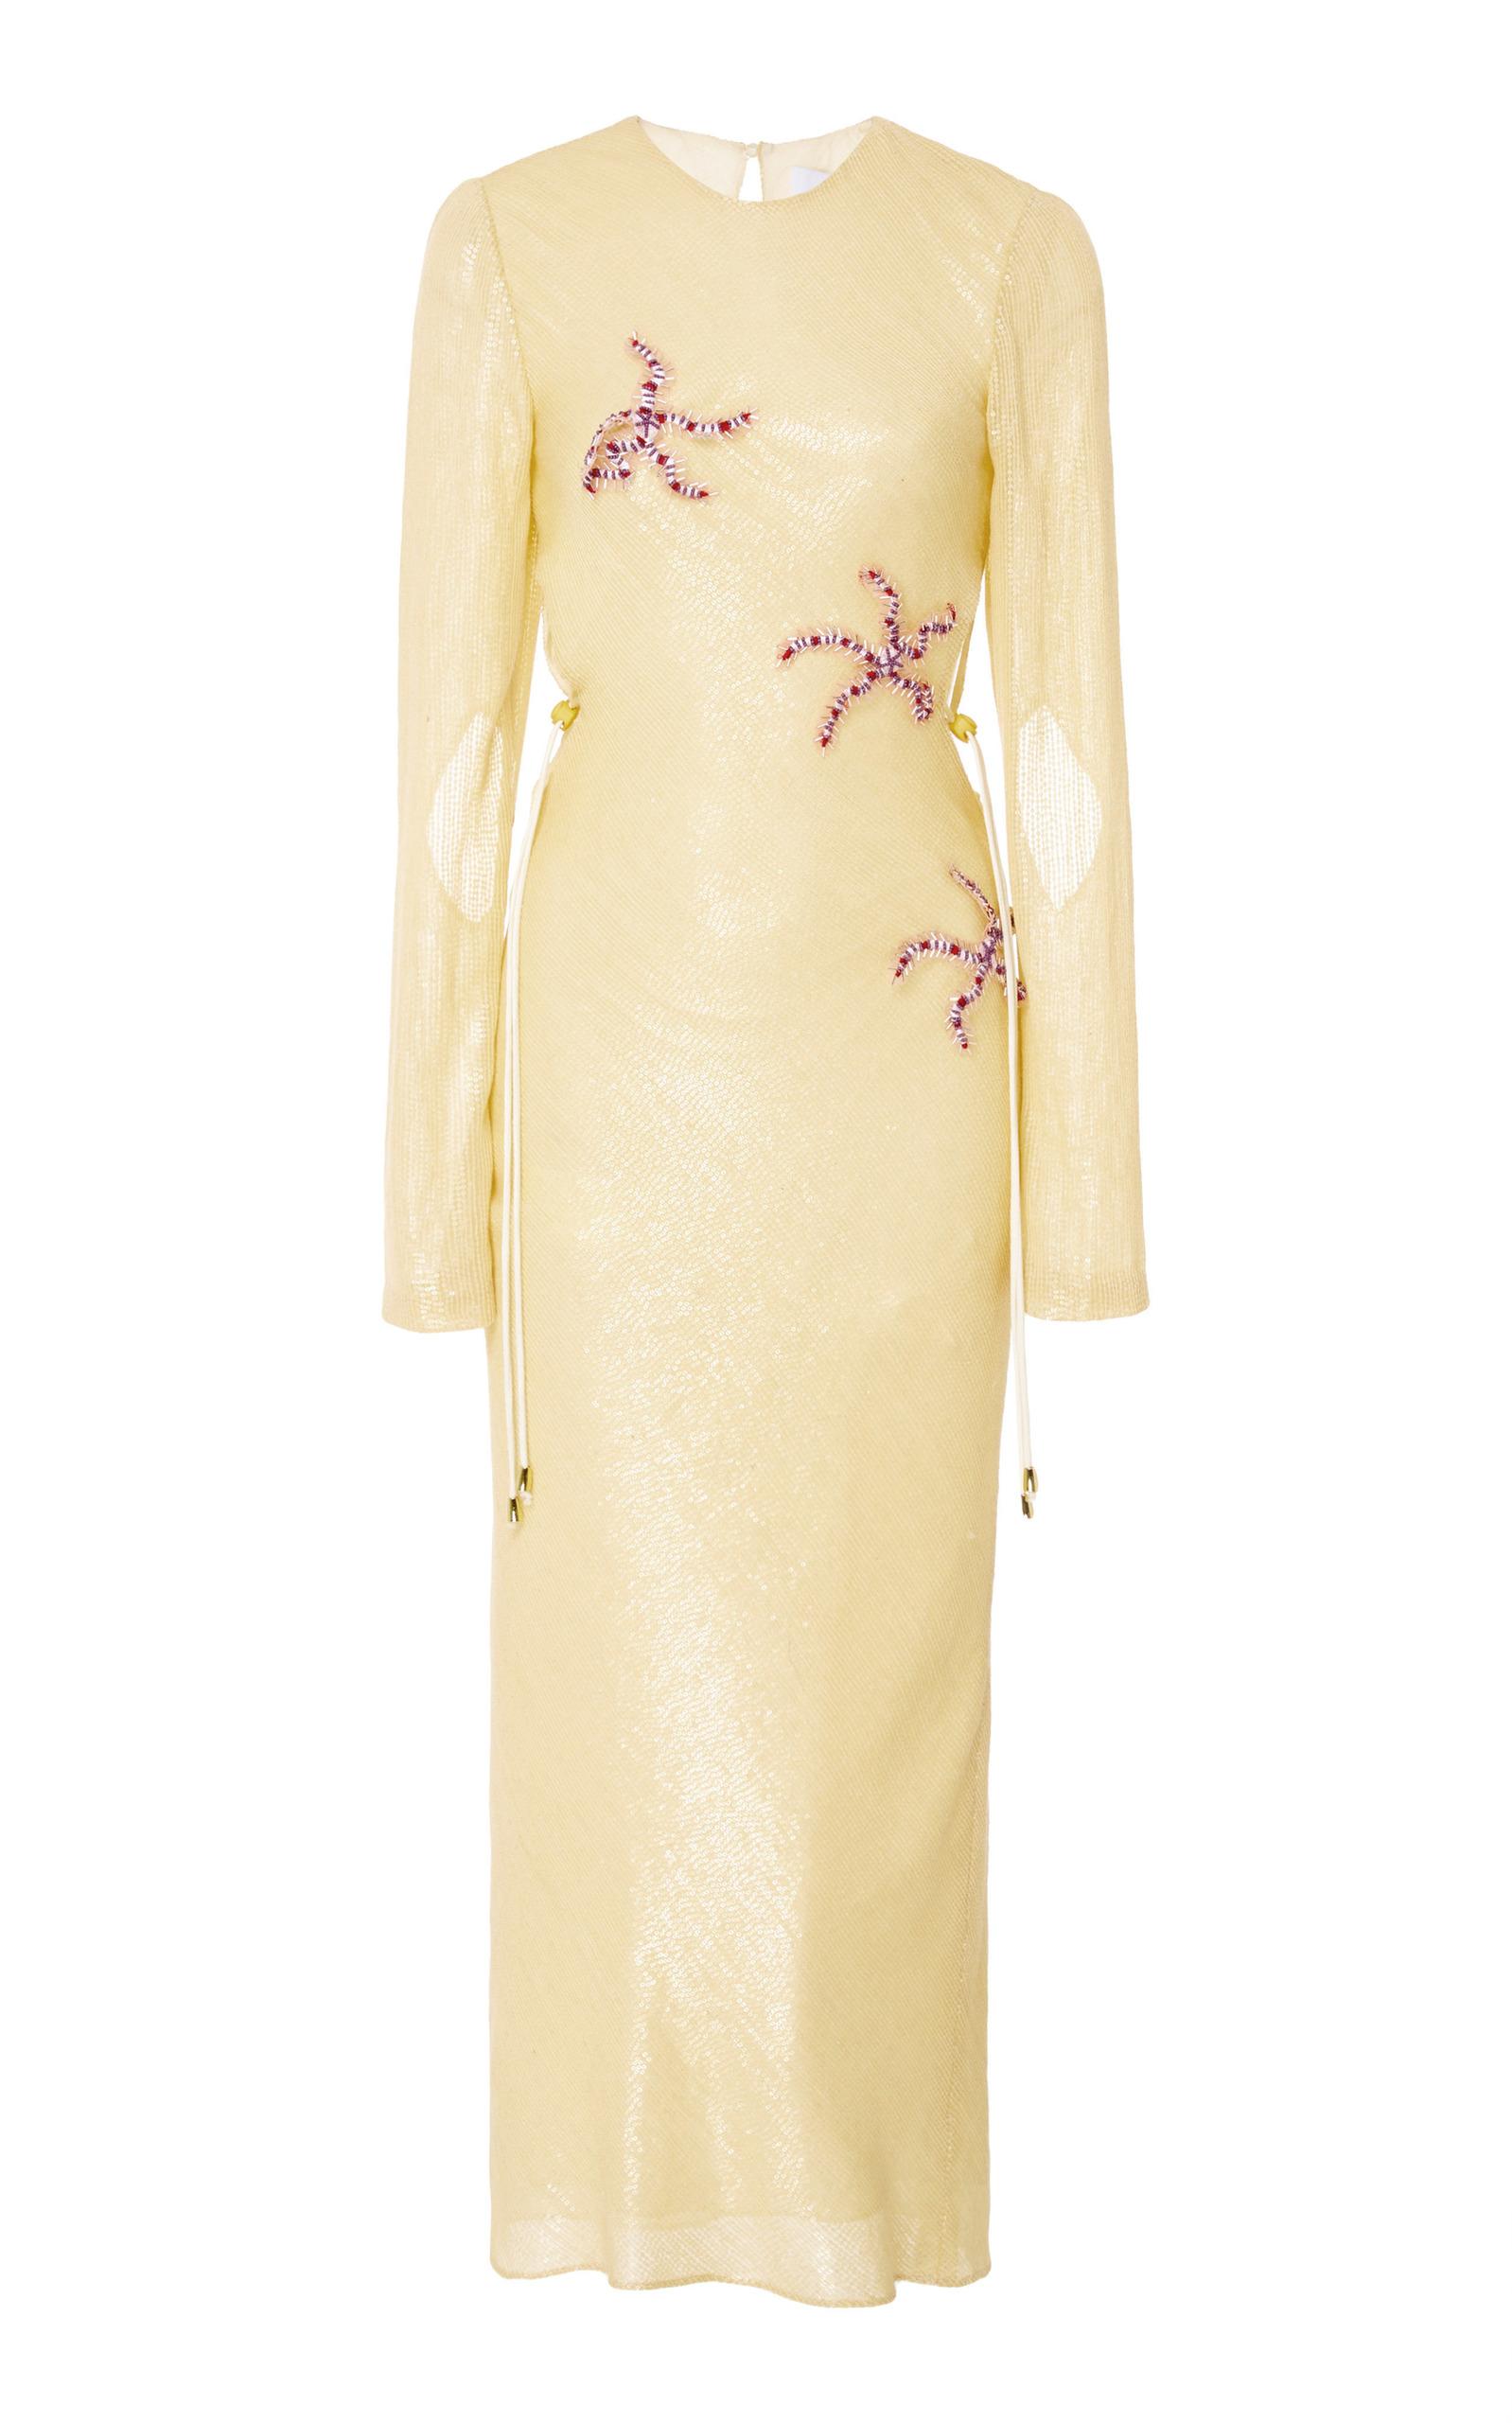 MARKARIAN Piscinus Sequin Midi Dress in Yellow